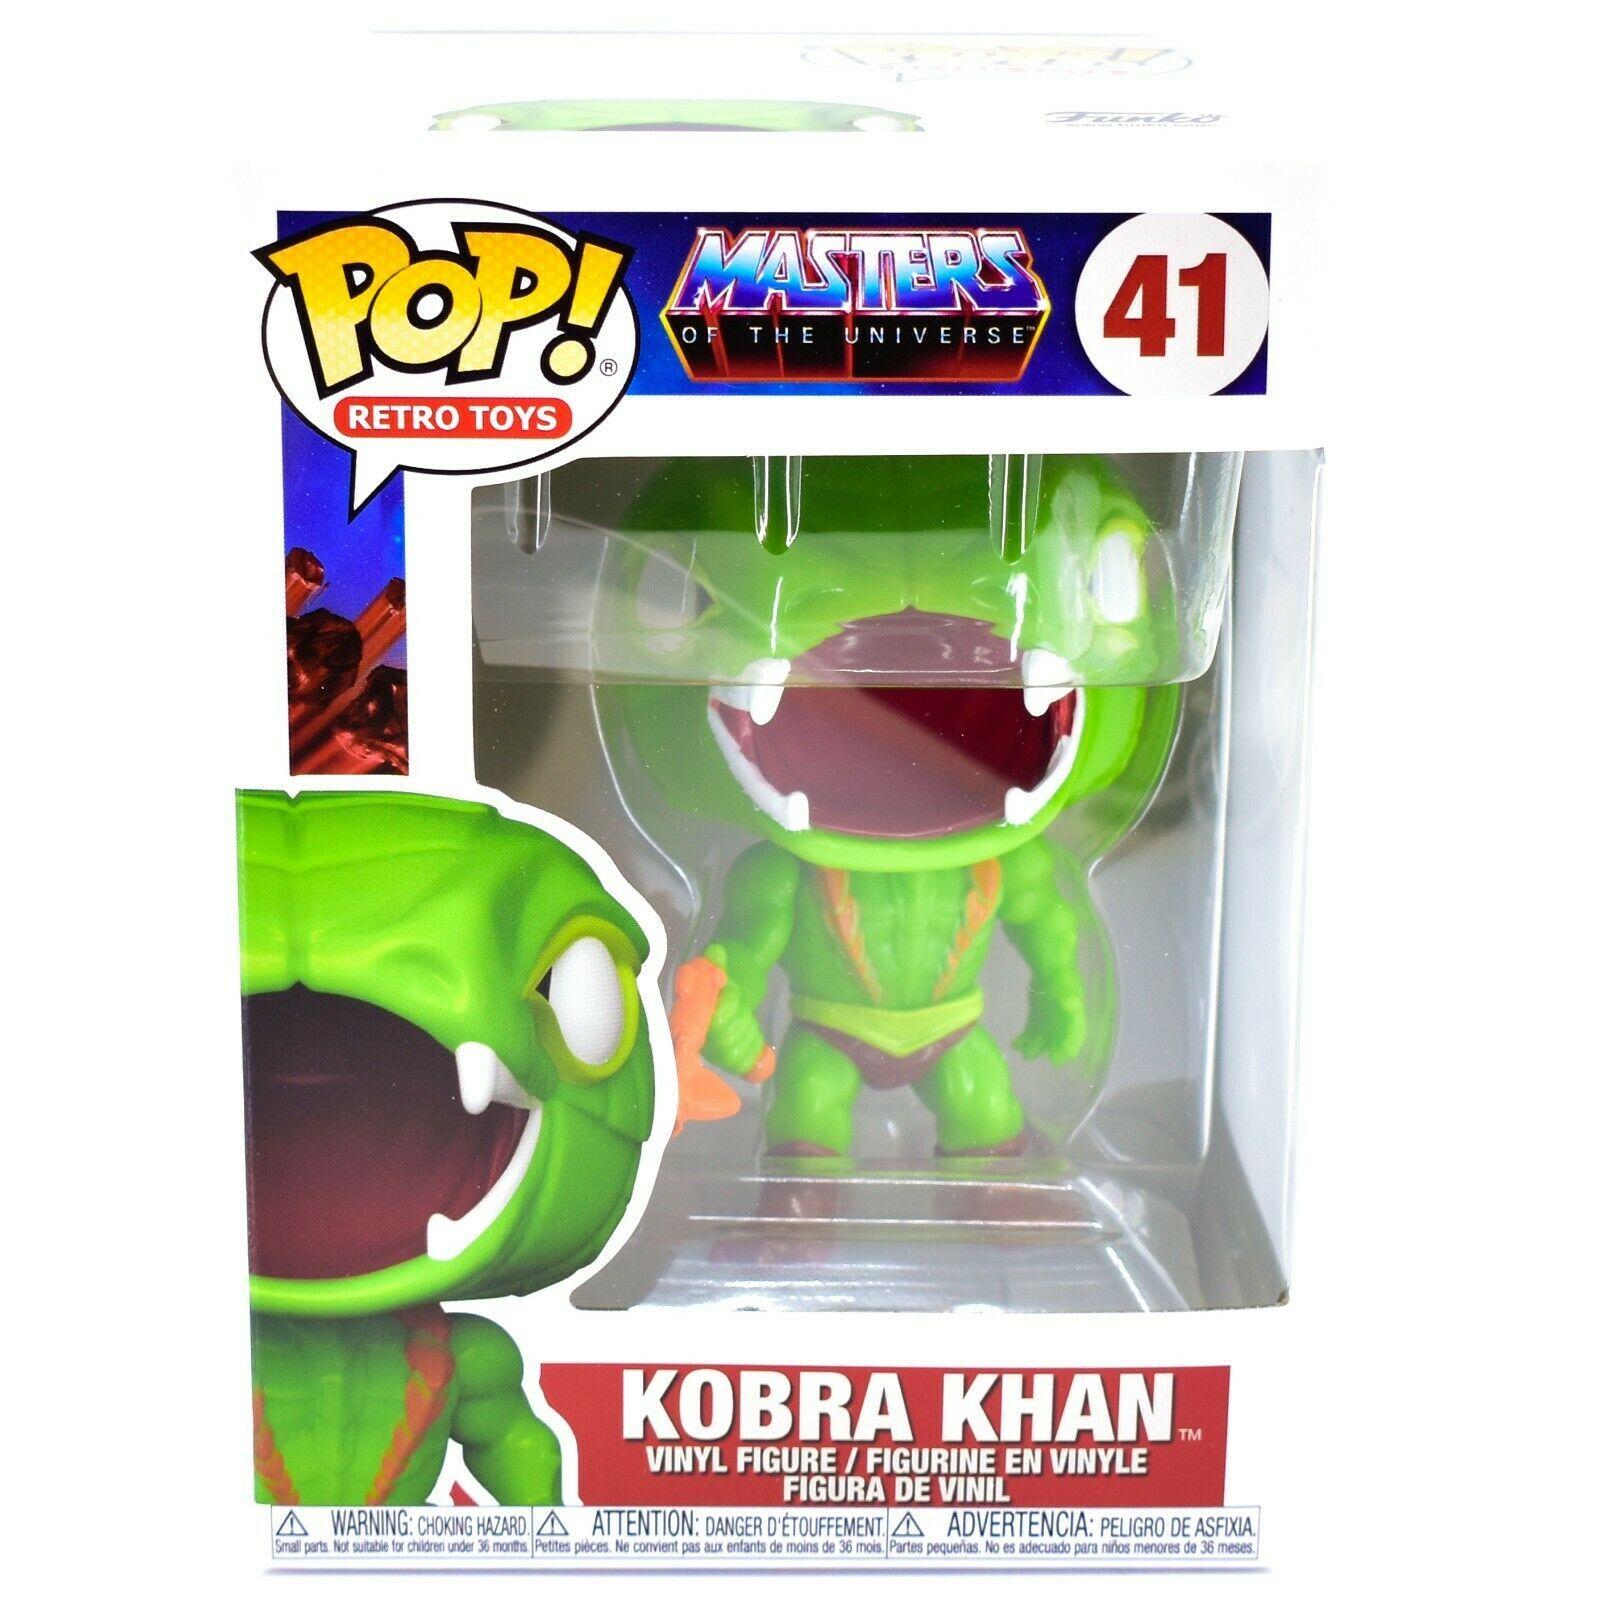 Funko Pop! Retro Toys Masters of the Universe MOTU Kobra Khan #41 Vinyl Figure